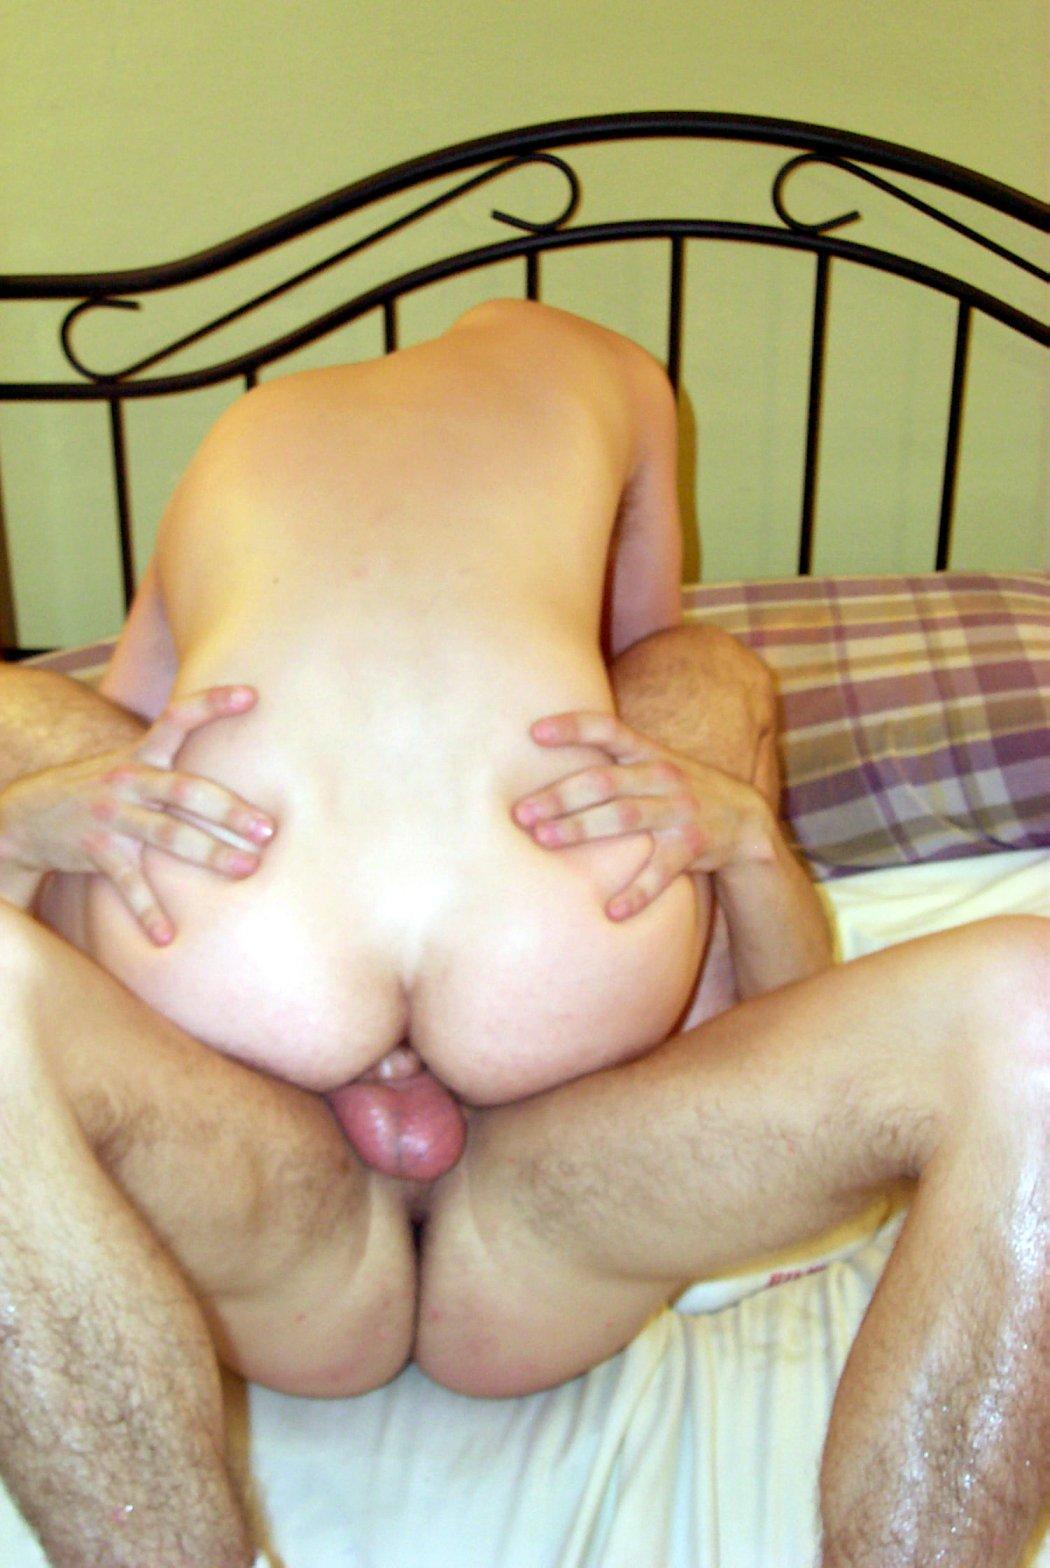 Sex positions nude ass sexy photos